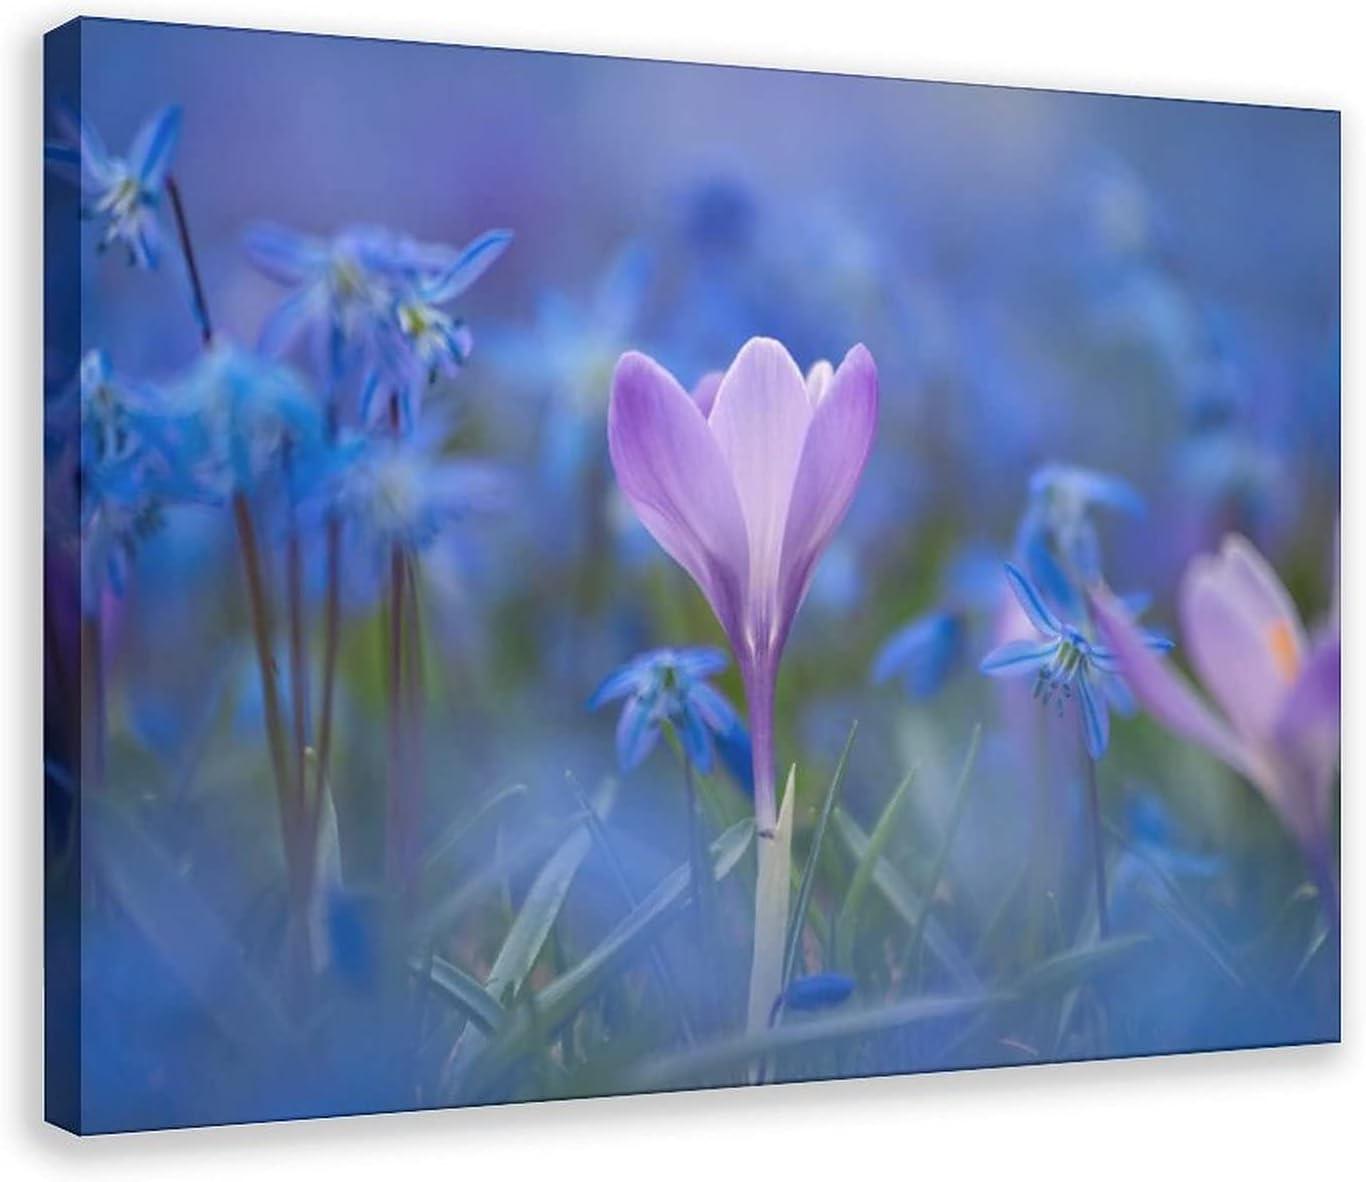 The First Flower of Spring Landscape Superlatite 2 Poster Rare Canvas Wallpaper